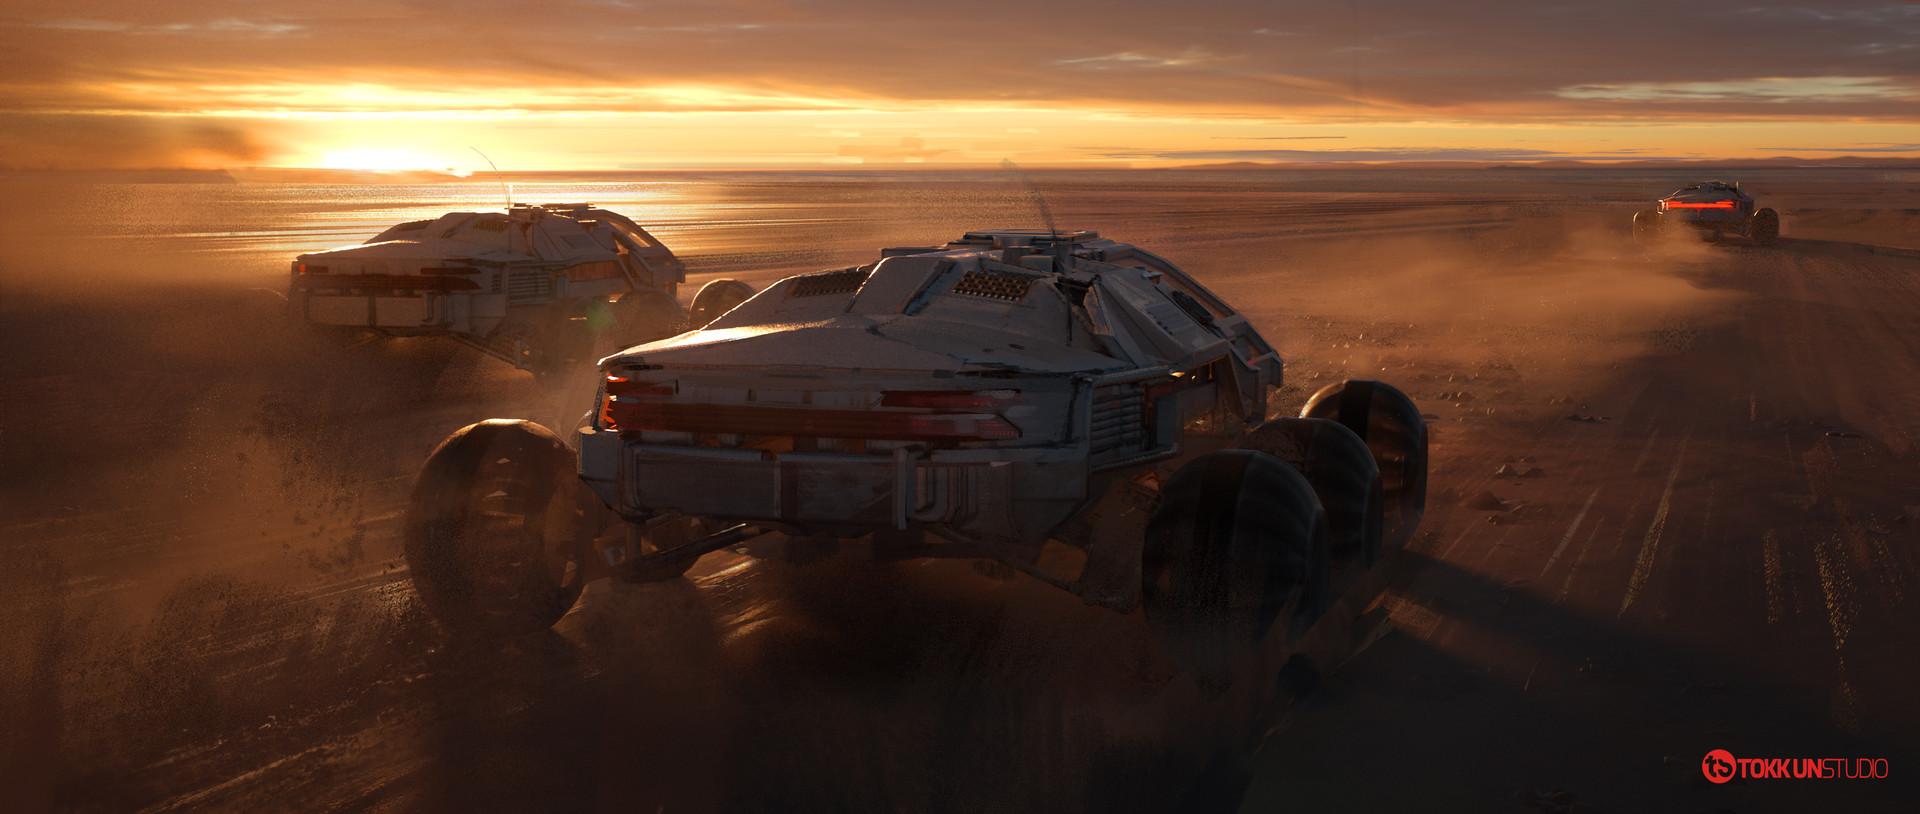 Tokkun studio rover ts concept 1